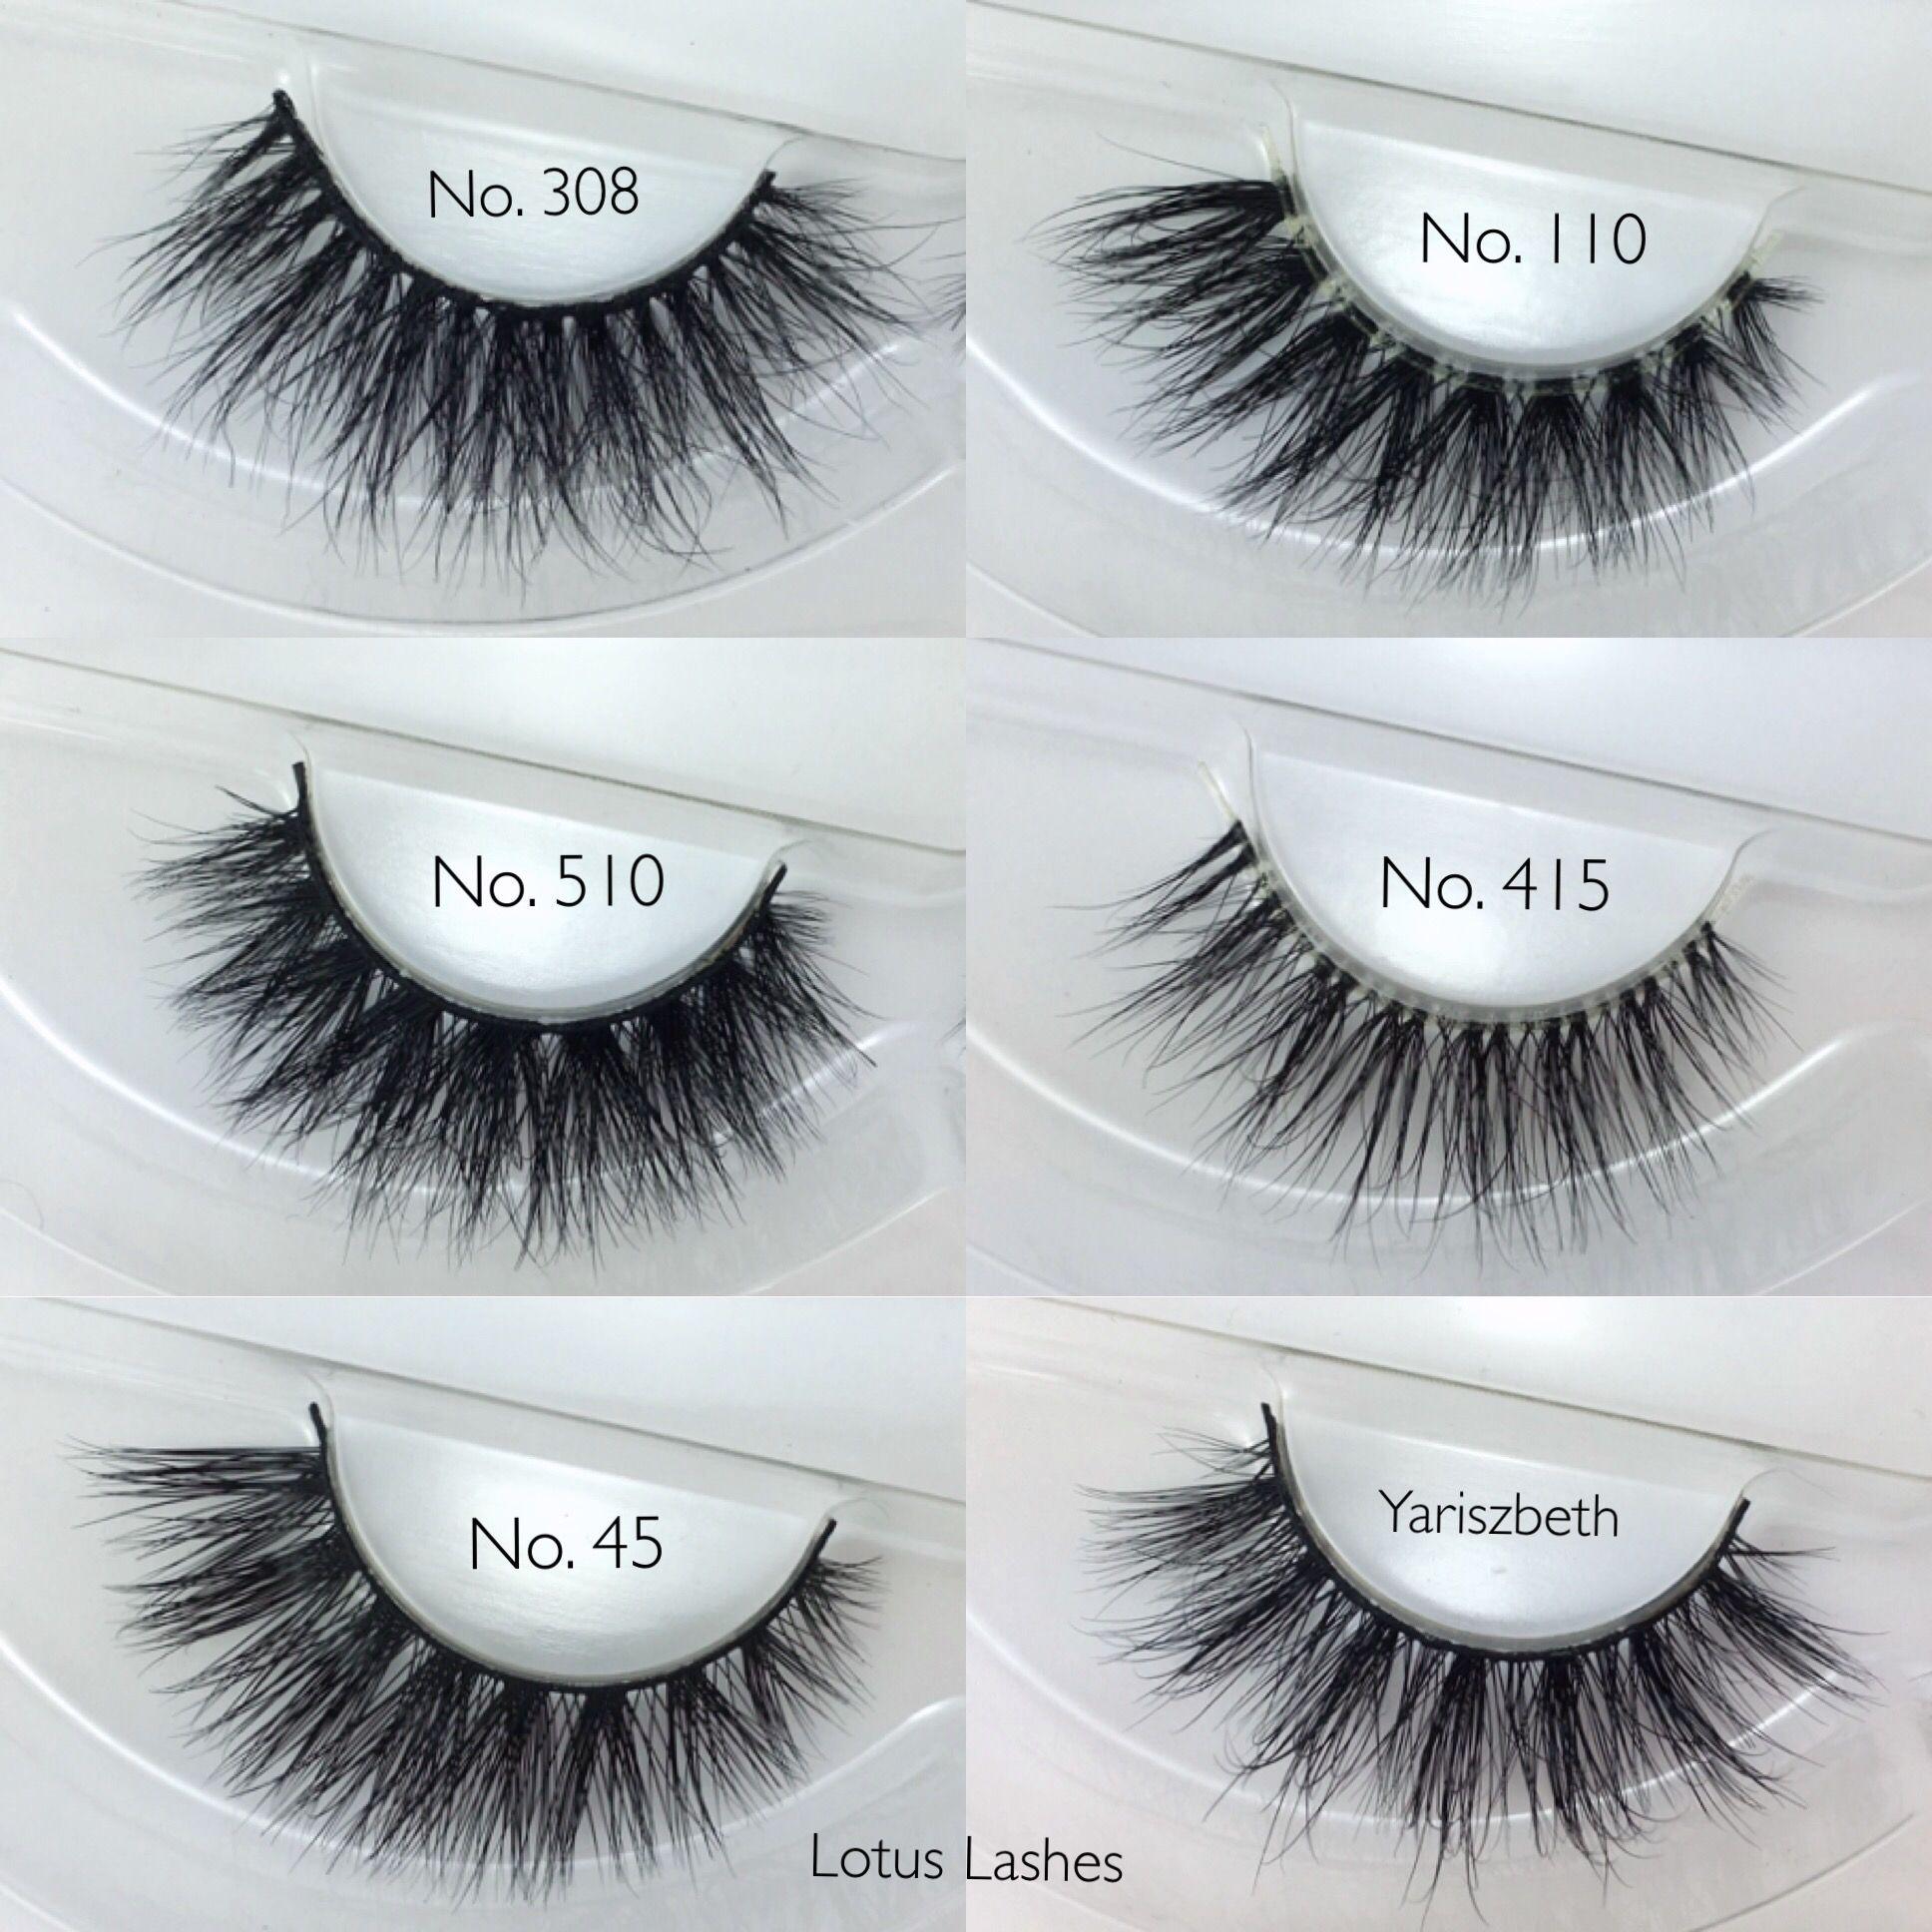 1e882f690e6 #LotusLashes   // Our Beautiful Lashes //   Lashes, Makeup, Beauty makeup